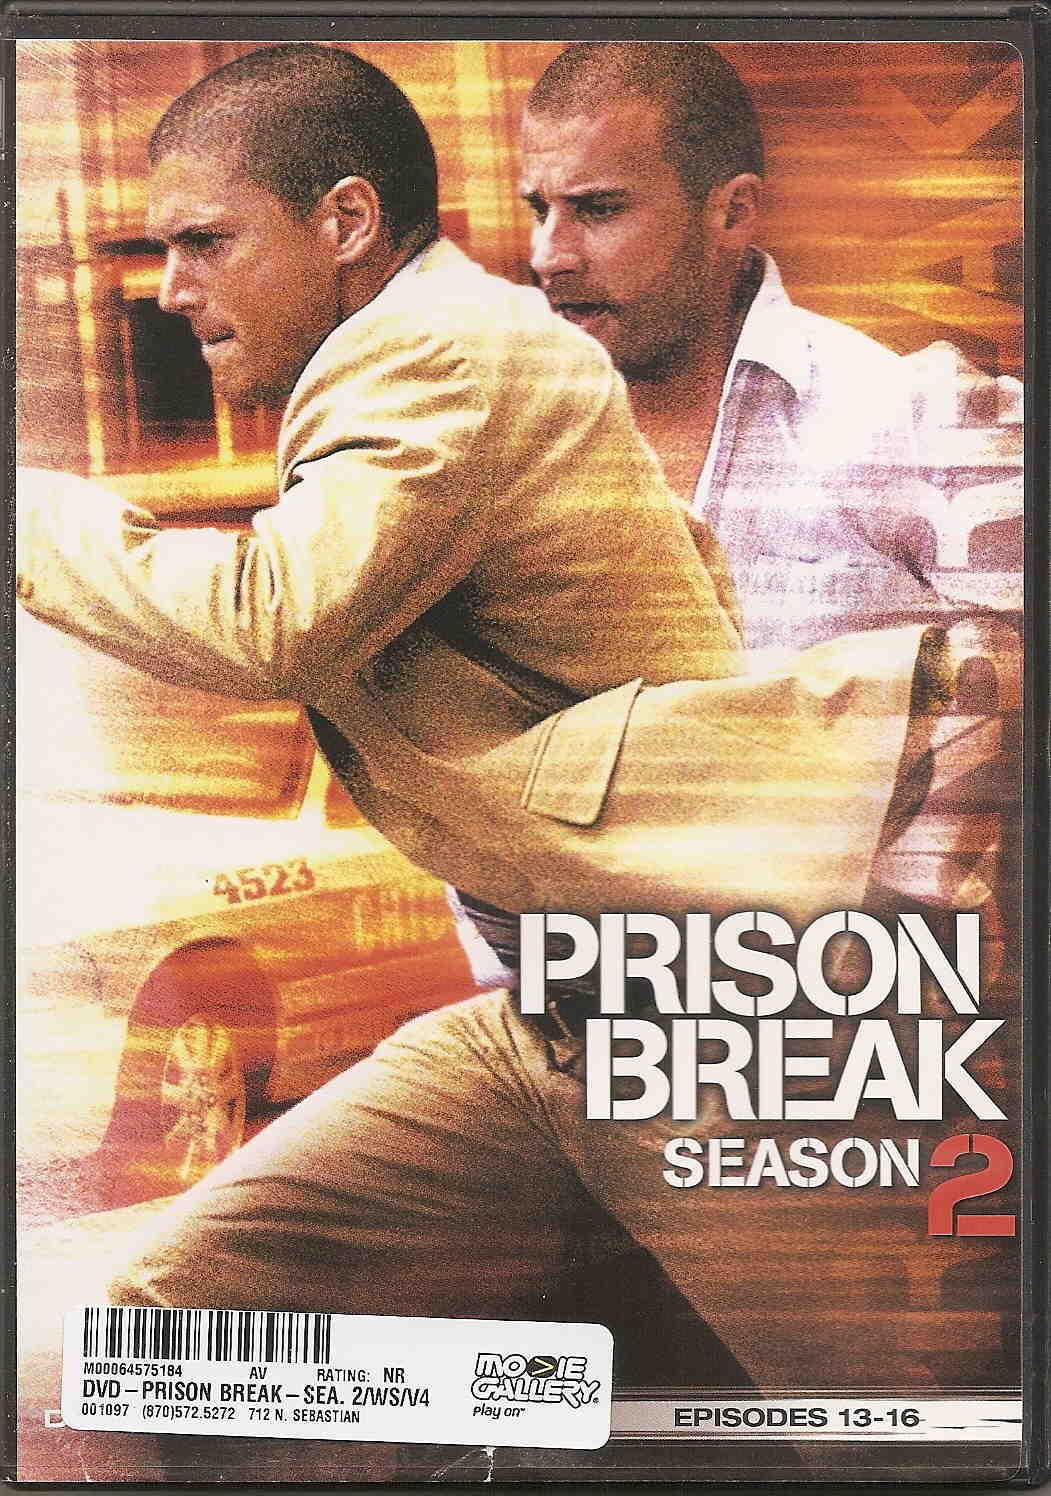 Amazon Com Prison Break Season 2 Disc 4 Episodes 13 16 Movies Tv